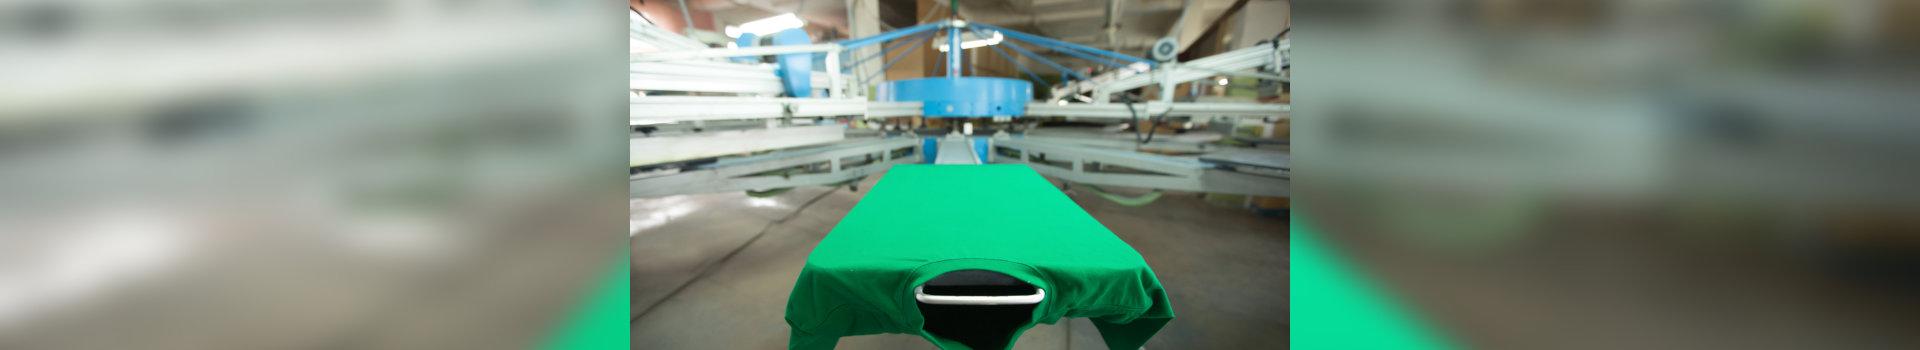 t-shirt silk screen printing machine